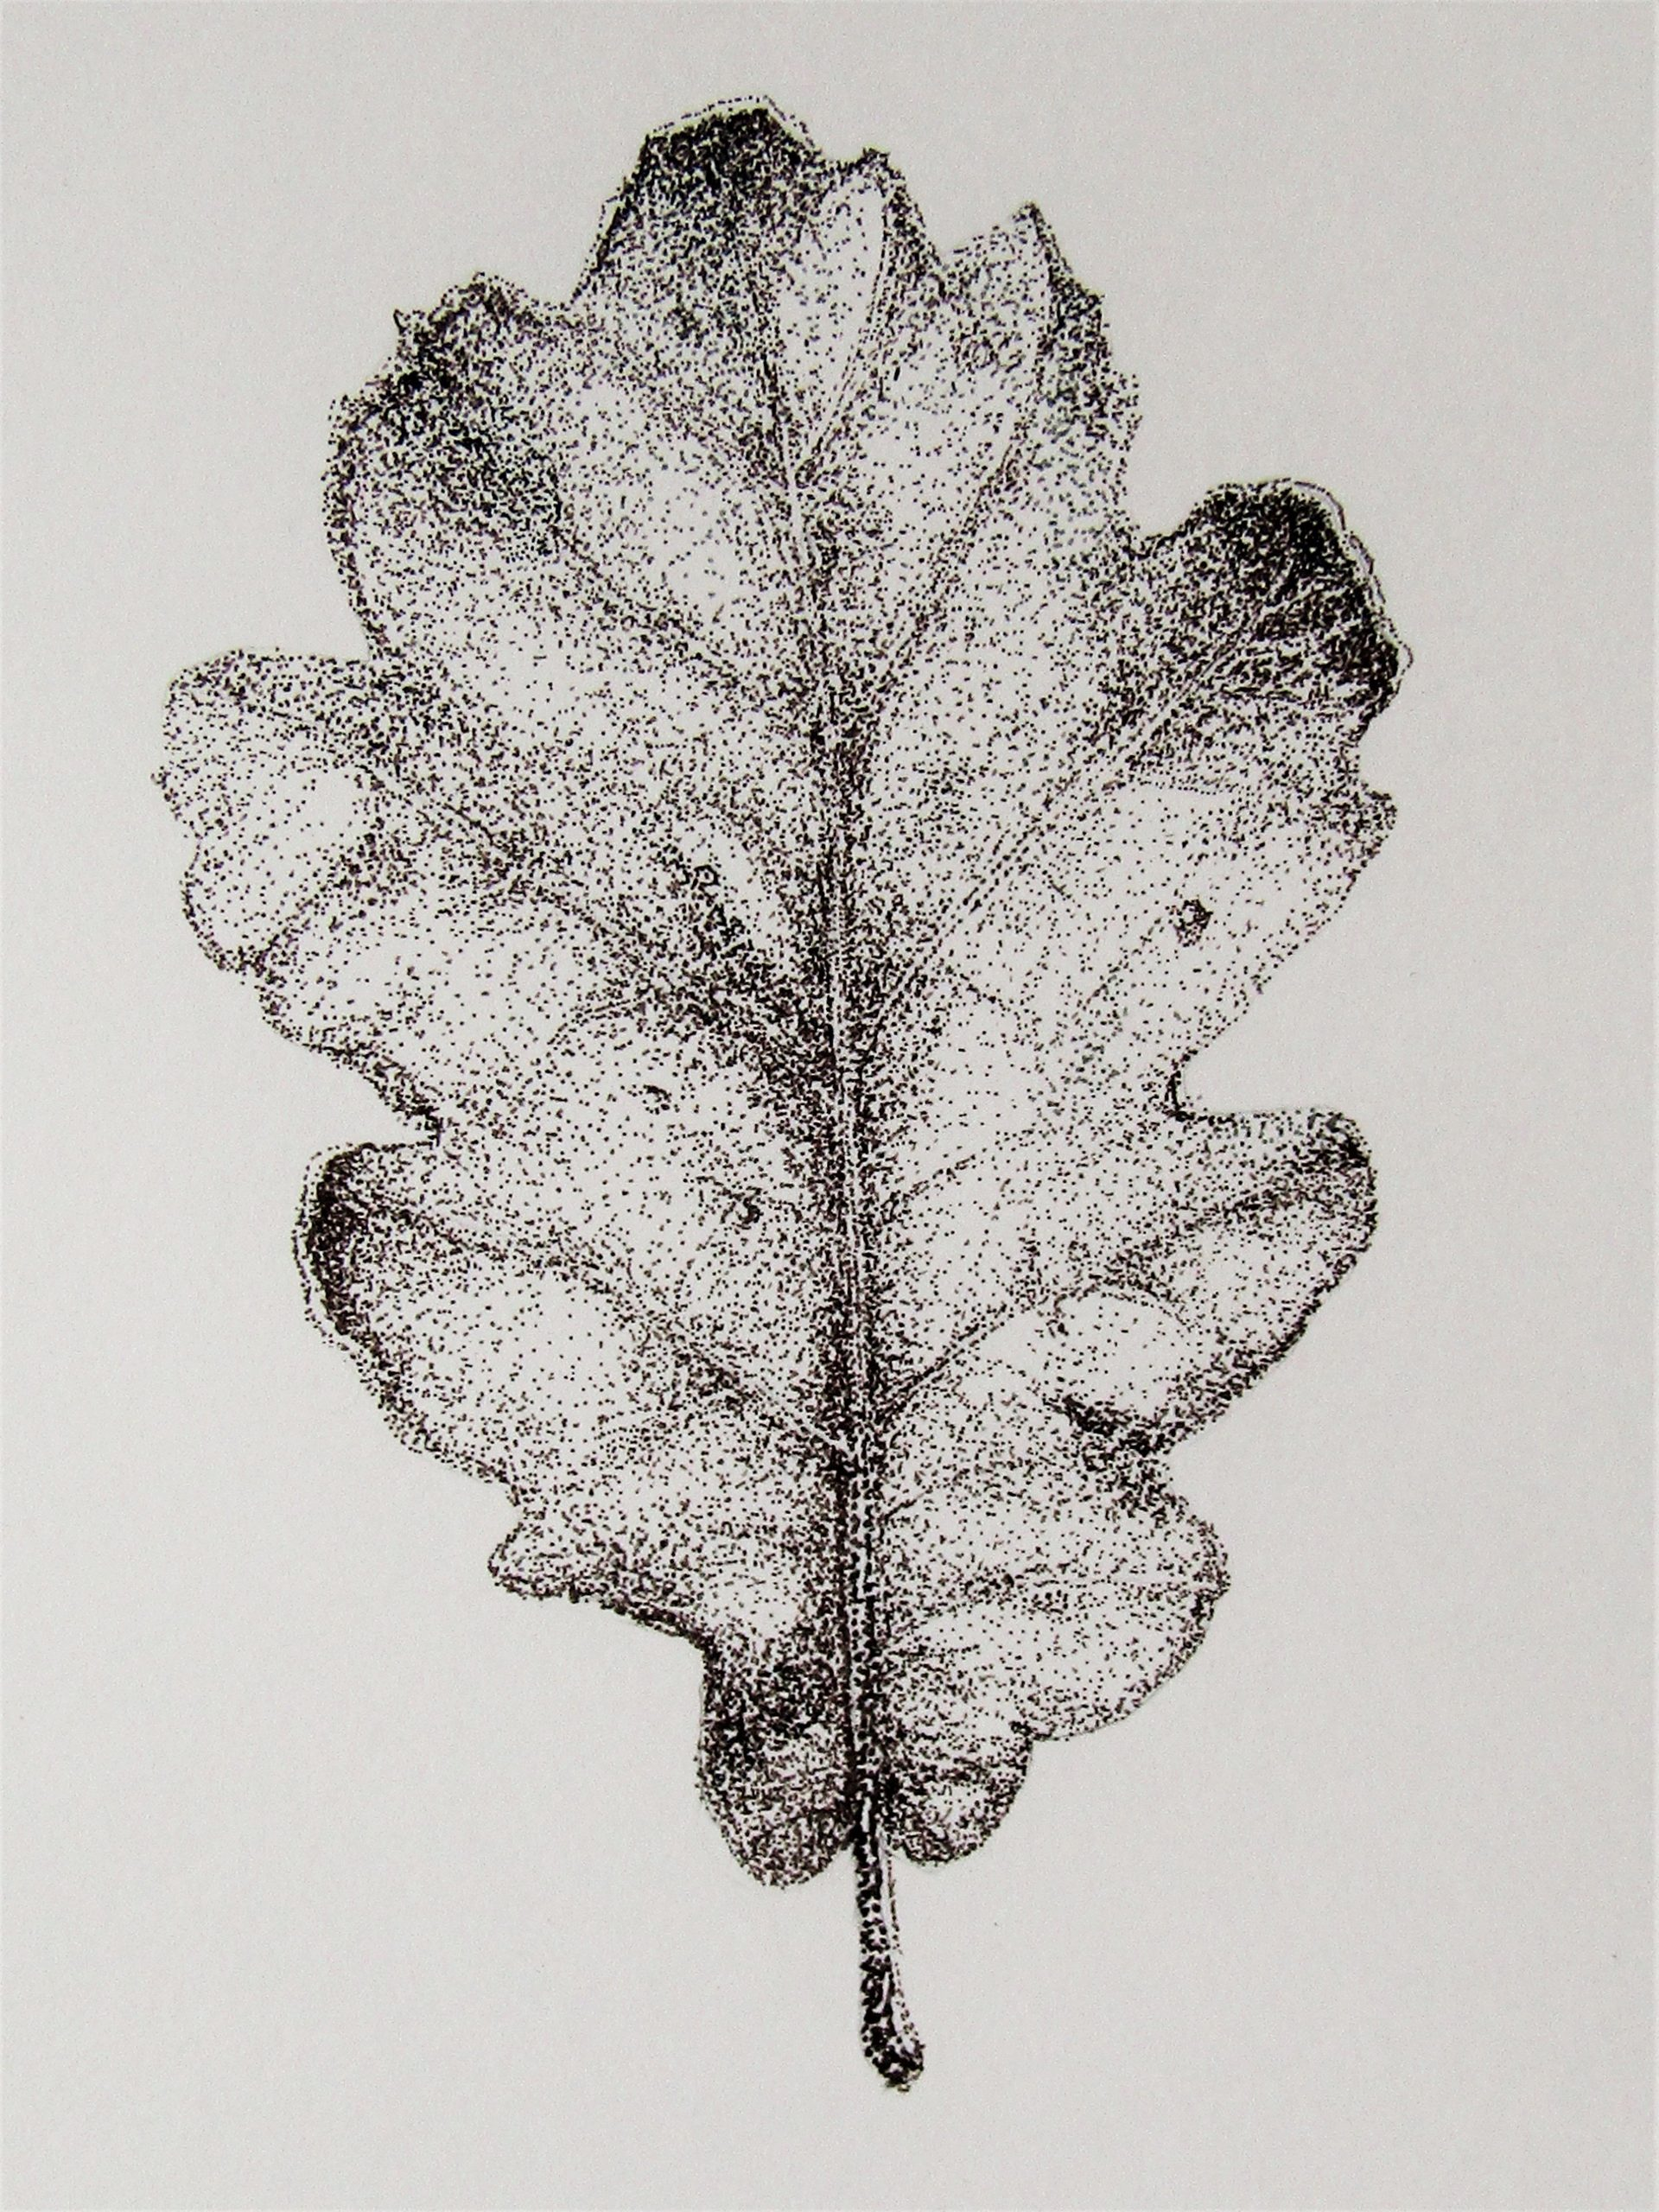 Feuille De Chene/oak Leaf Dessin A L'encre Pointille Ink encequiconcerne Dessin En Pointillé